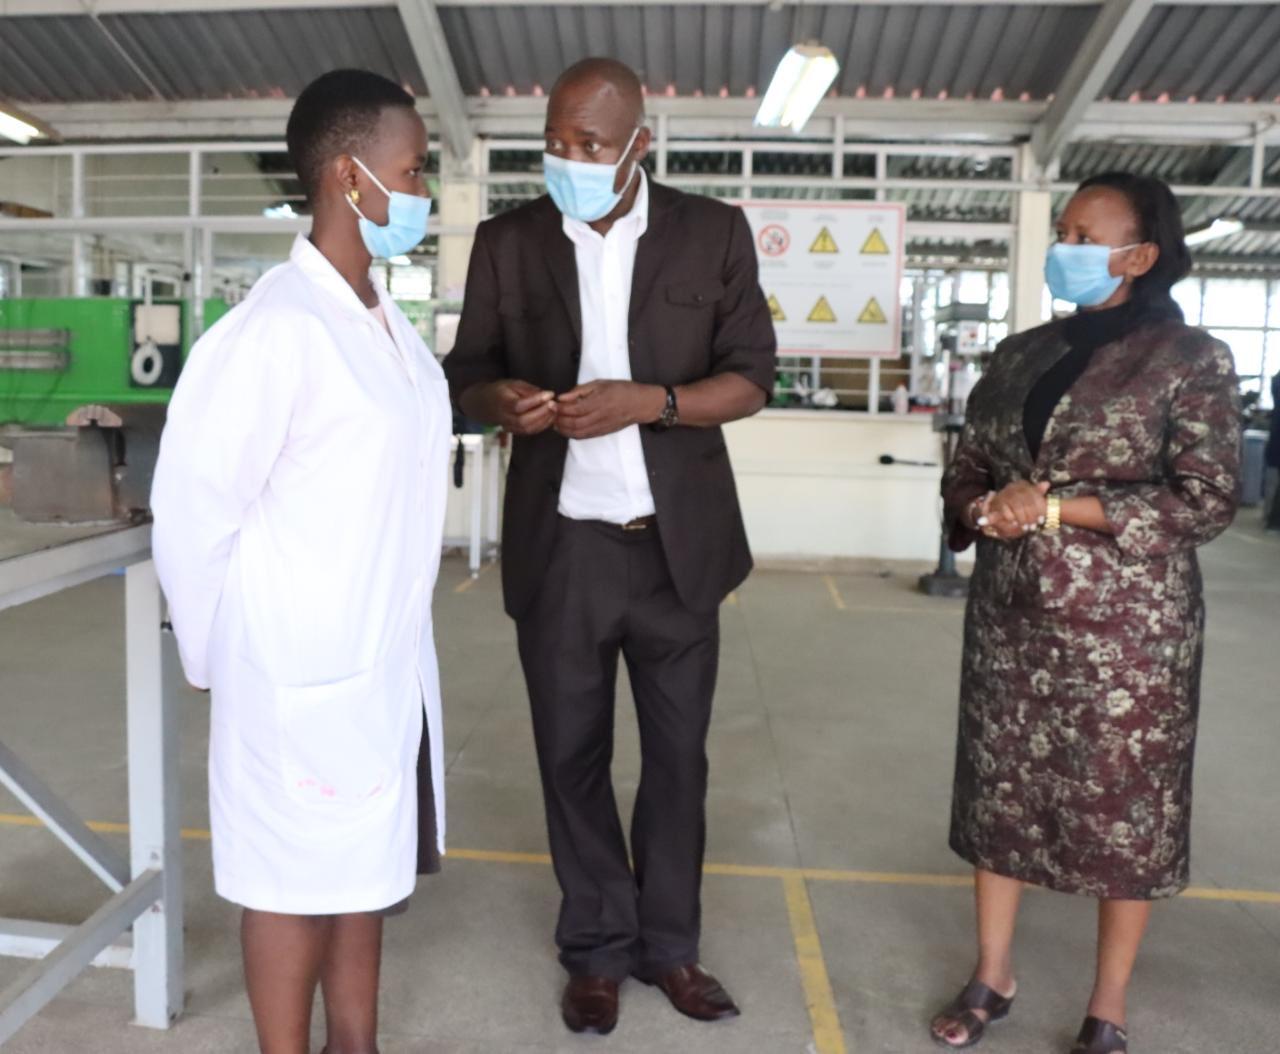 RPL Assessors and applicants at Nairobi TTI RPL Assessment centre. Similair exercise is happening at NITA assessment centres in Nairobi ,Kajiado and Mombasa.